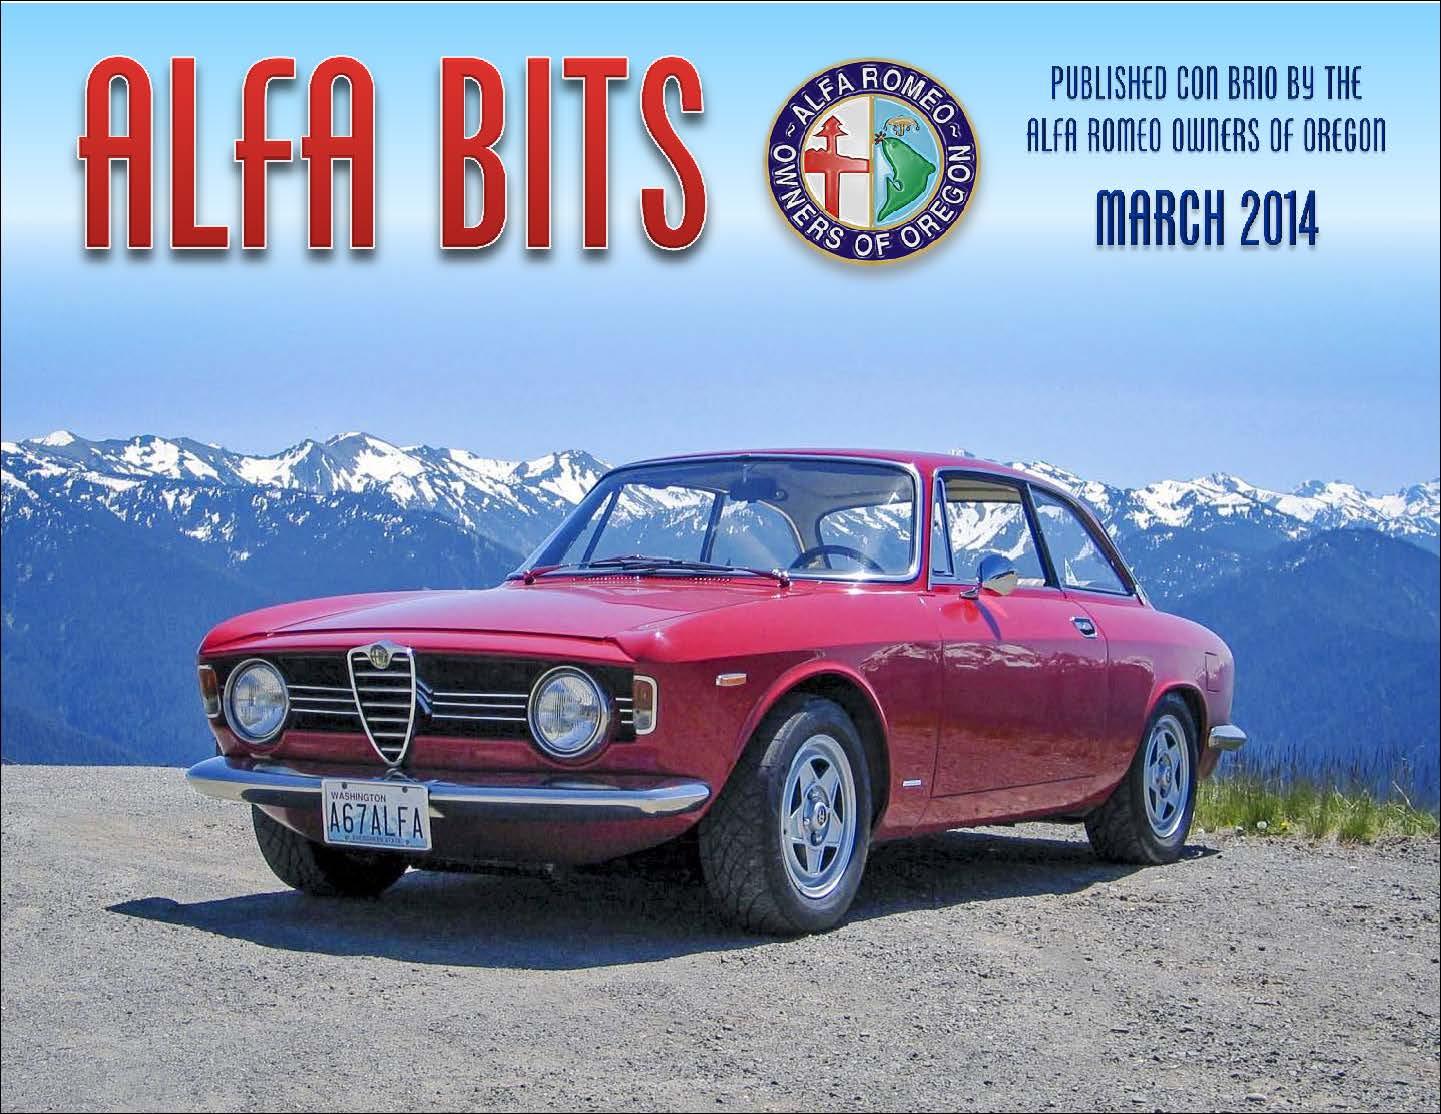 www.alfaclub.org_Newsletters_files_ALFA BITS 2014 03-C_Page_01